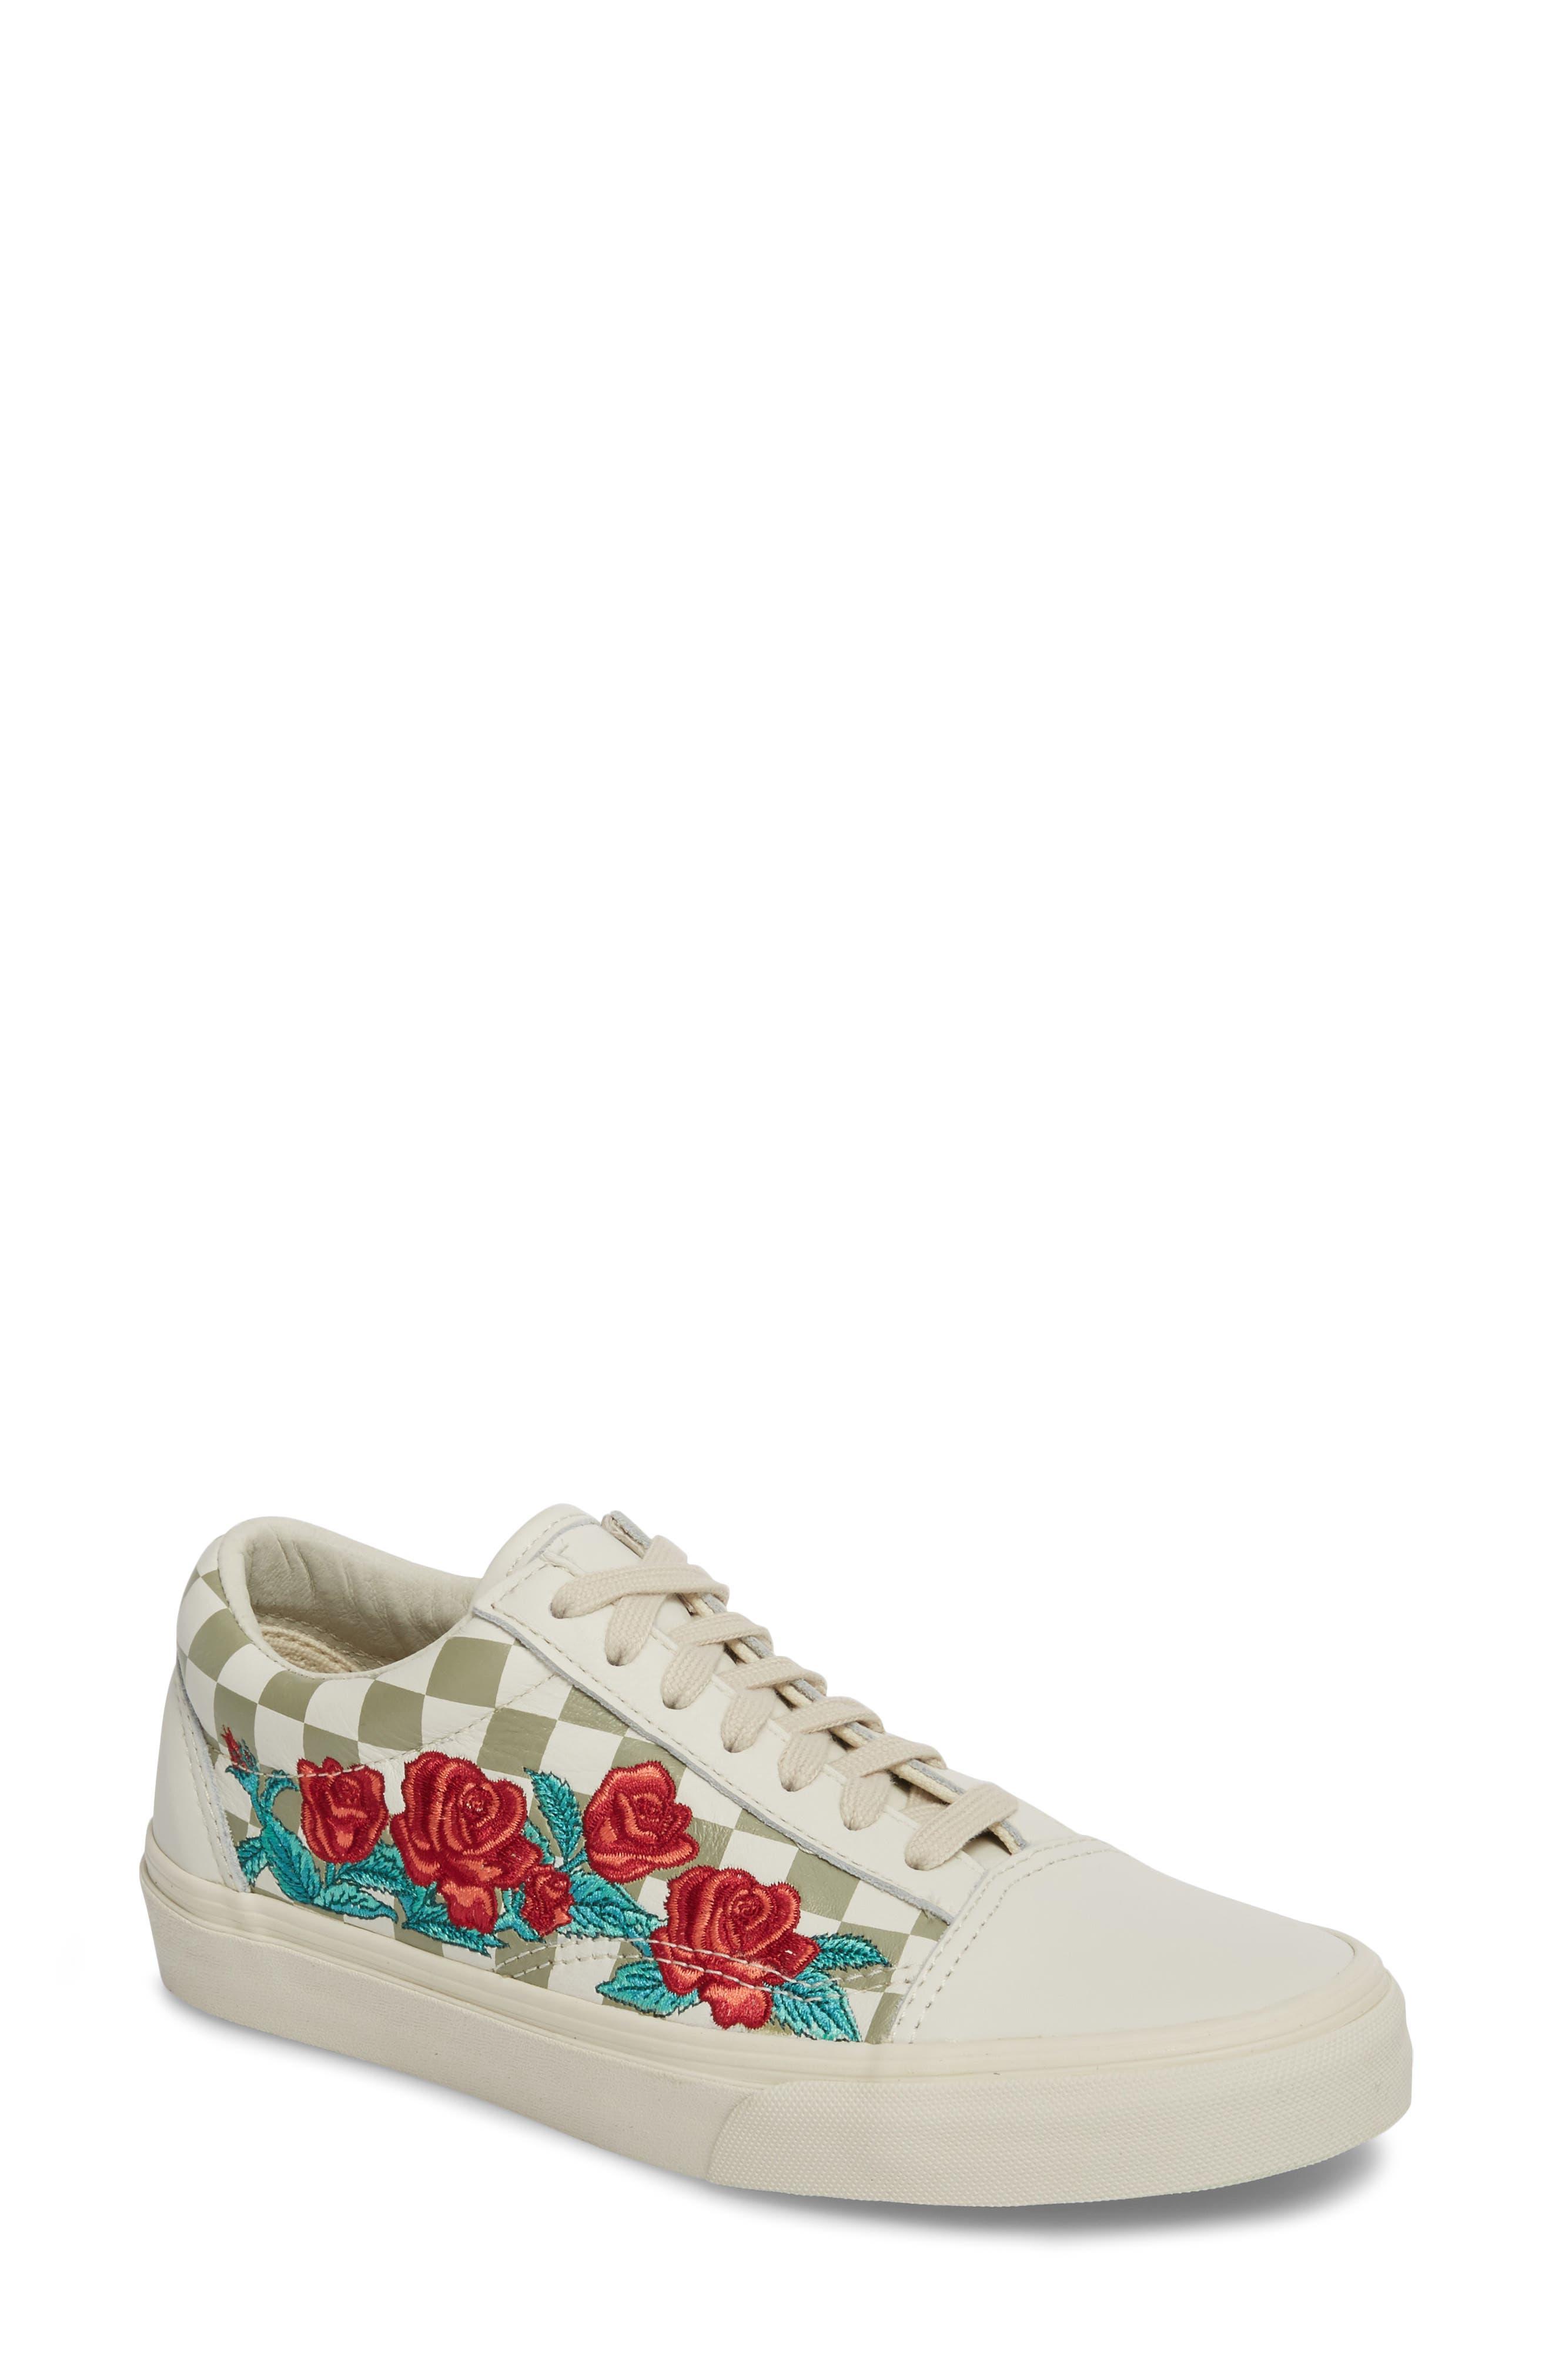 Old Skool 36 DX Sneaker,                         Main,                         color, 100